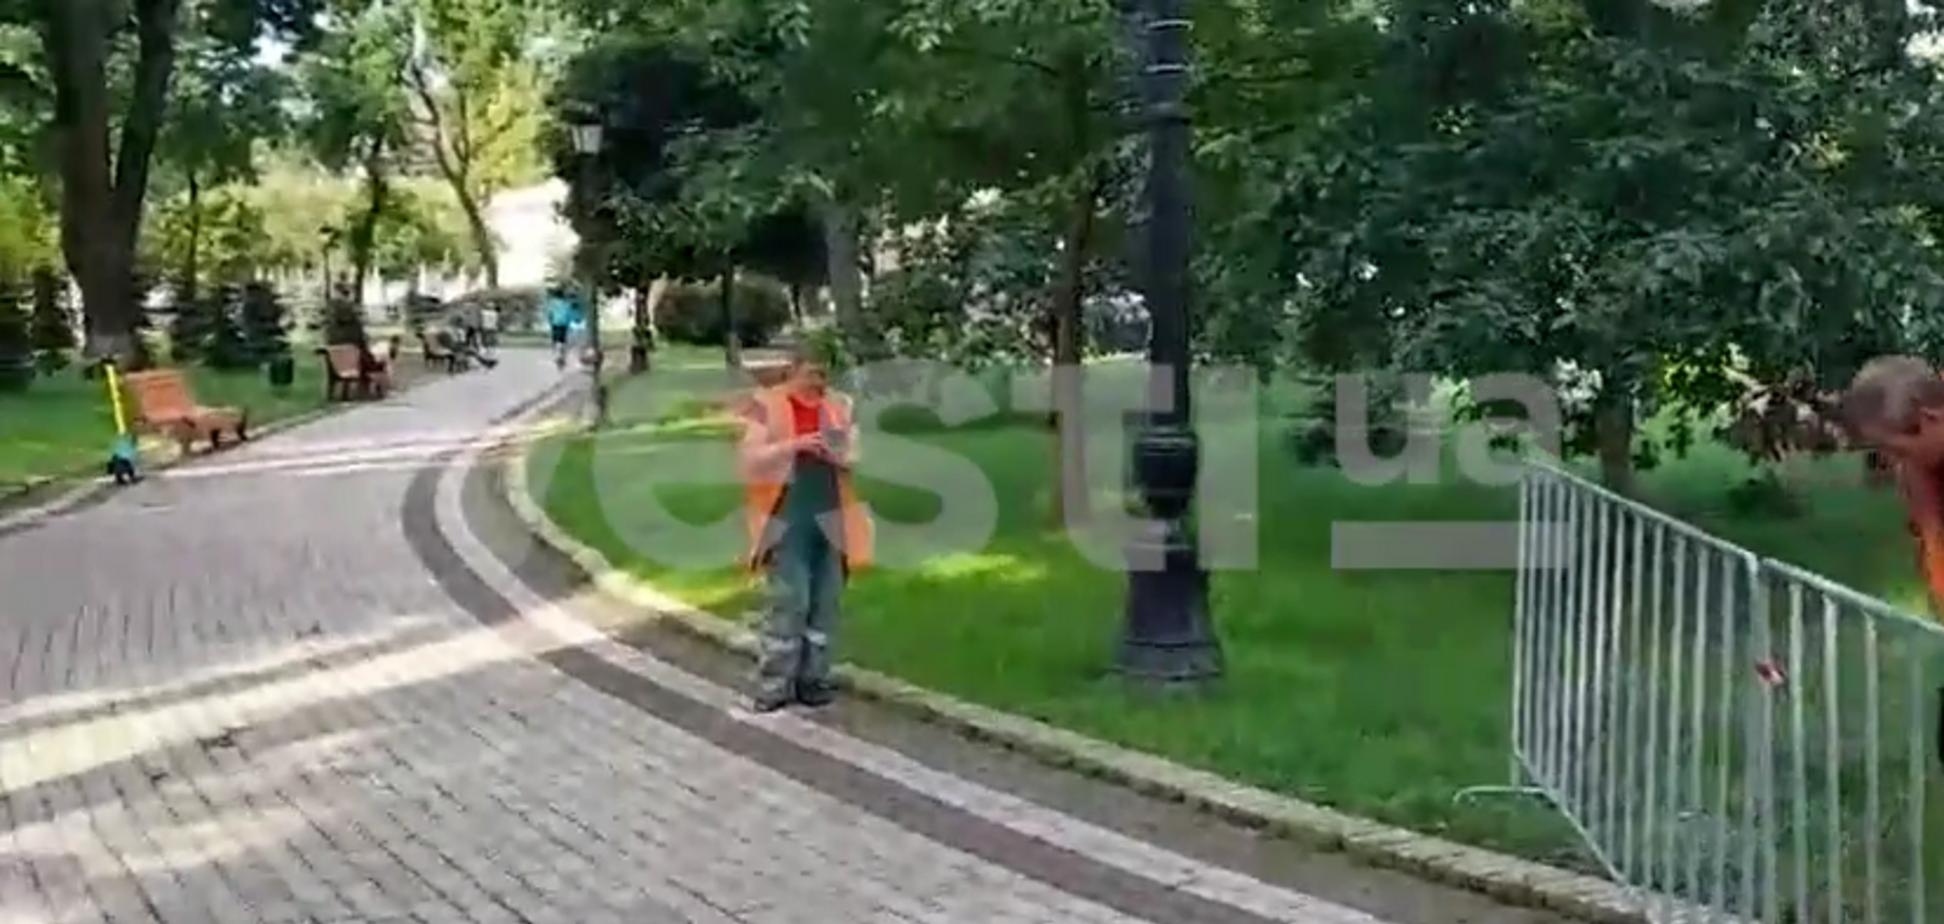 Мариинский парк чистят и убирают перед визитом Зурабишвили